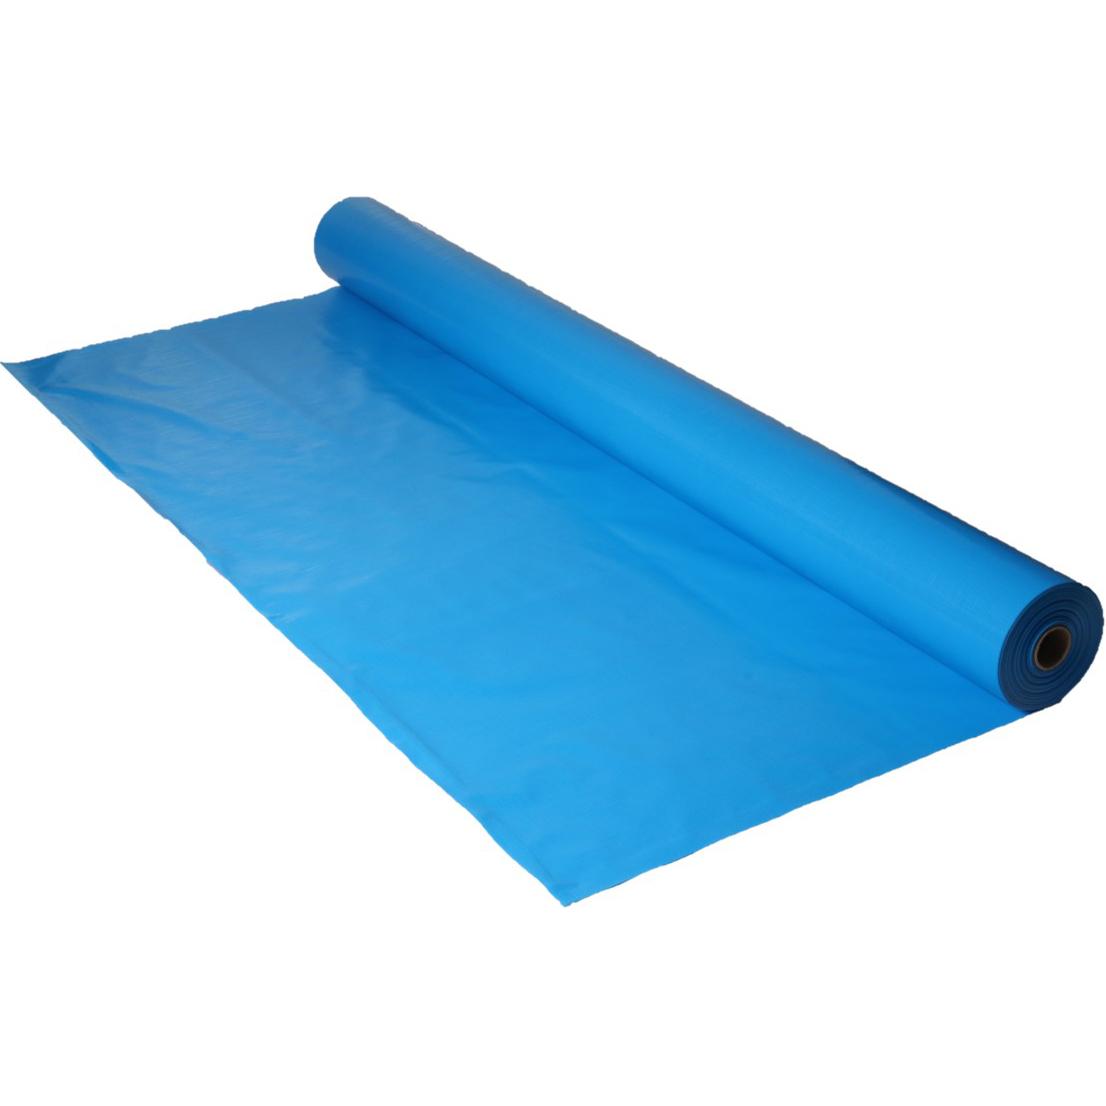 Japanese PE Coated Anti-uv Woven Plain Outdoor PVC Tarp Shelter